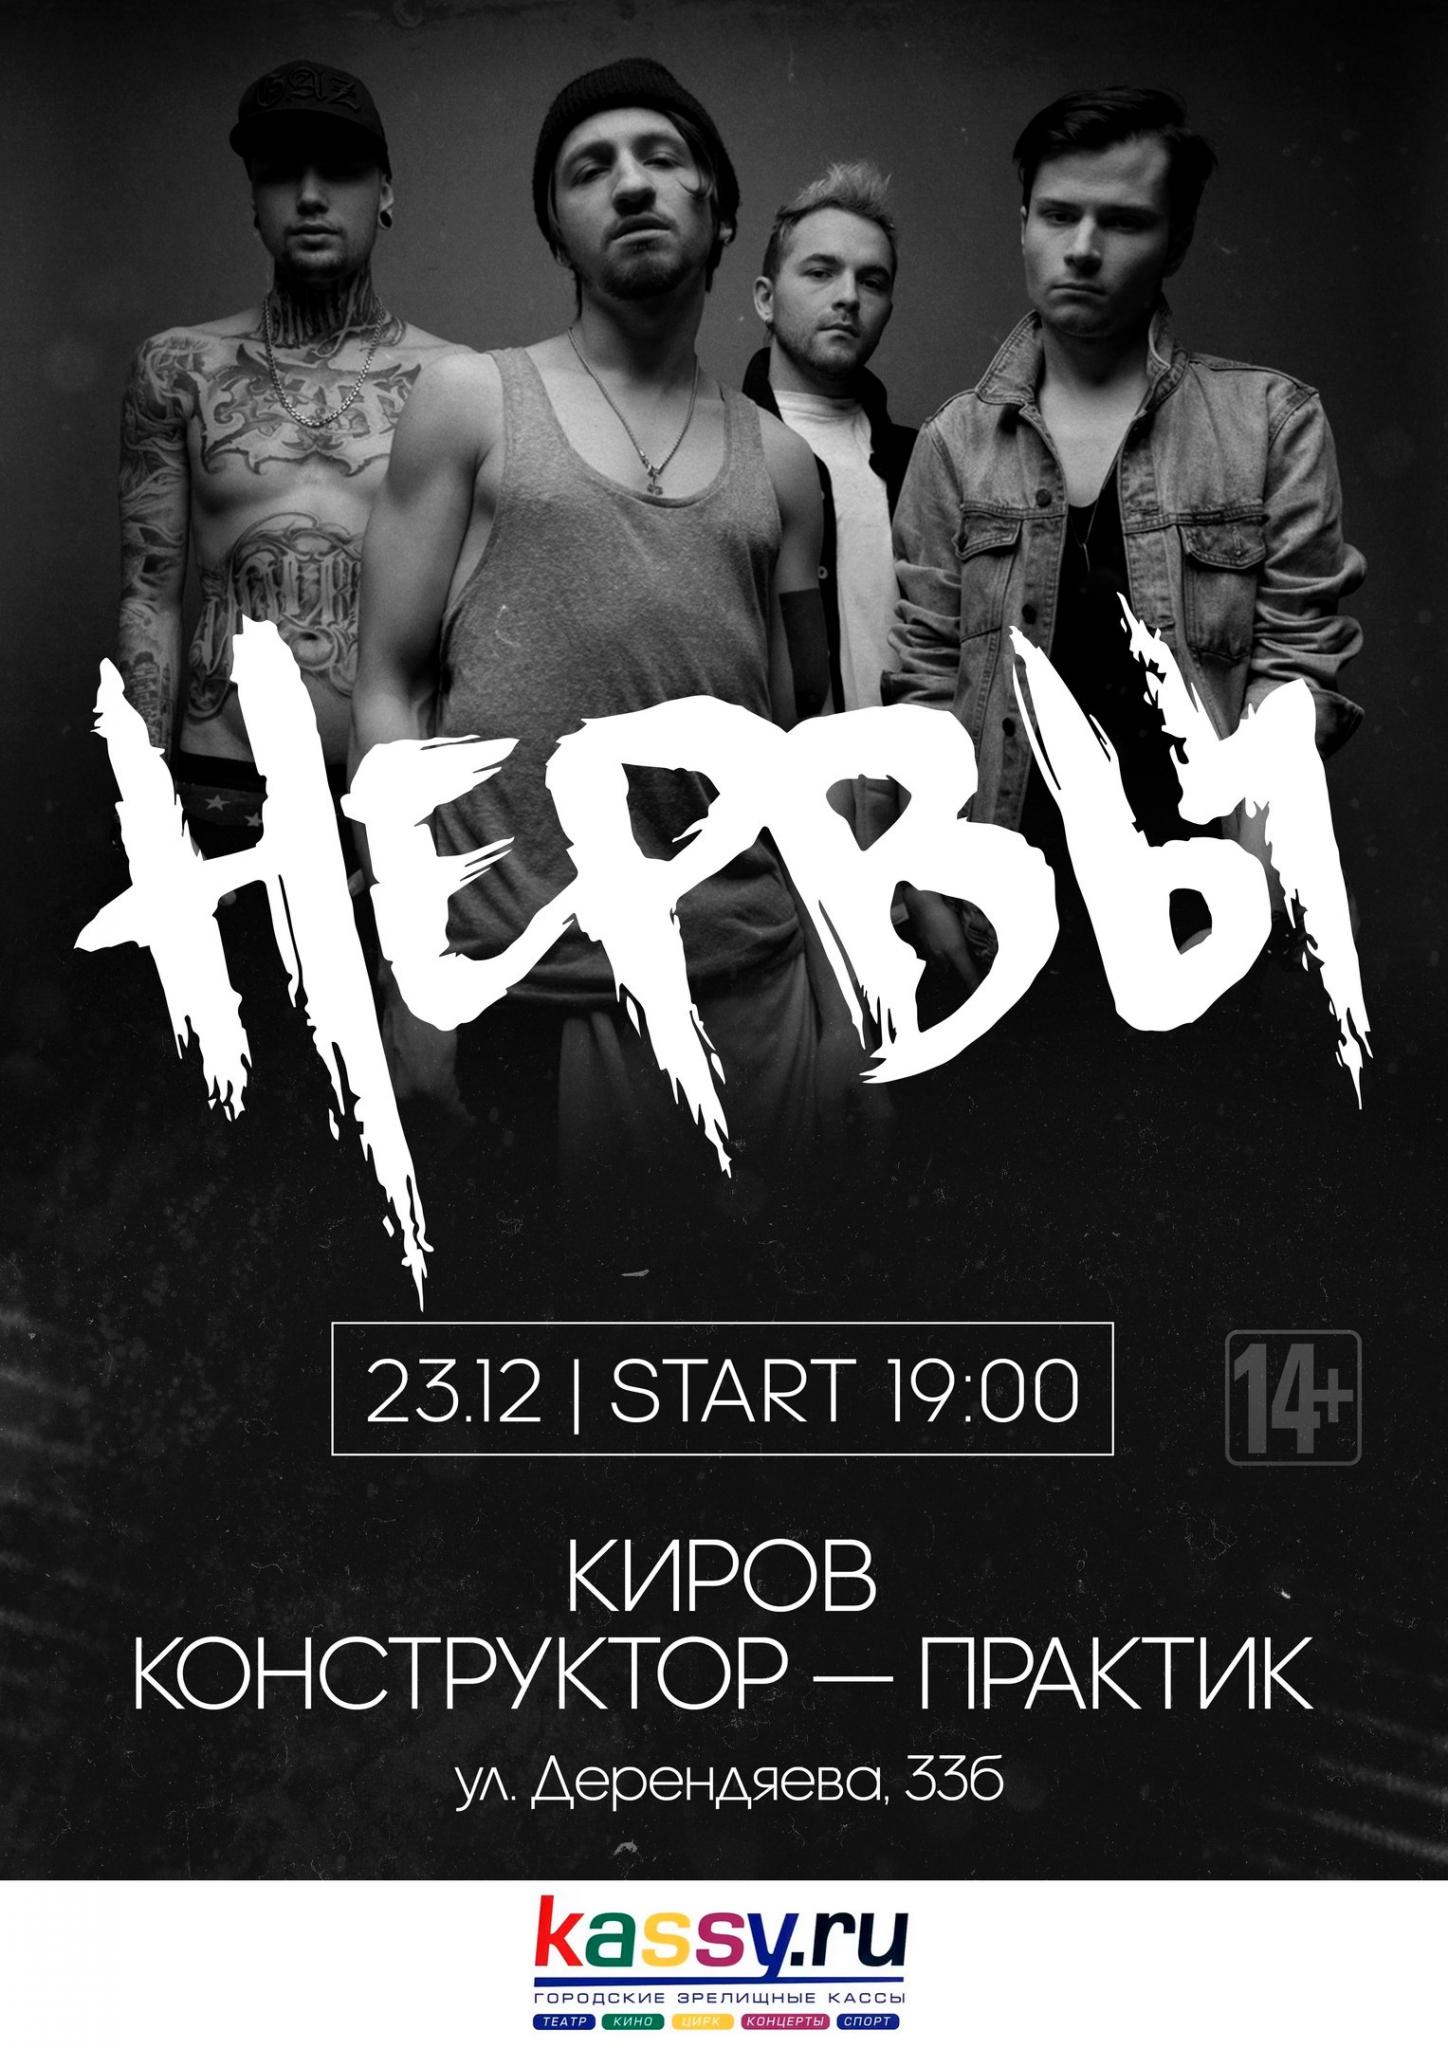 Афиша киров 2016 концерты афиша спб концерты розенбаума